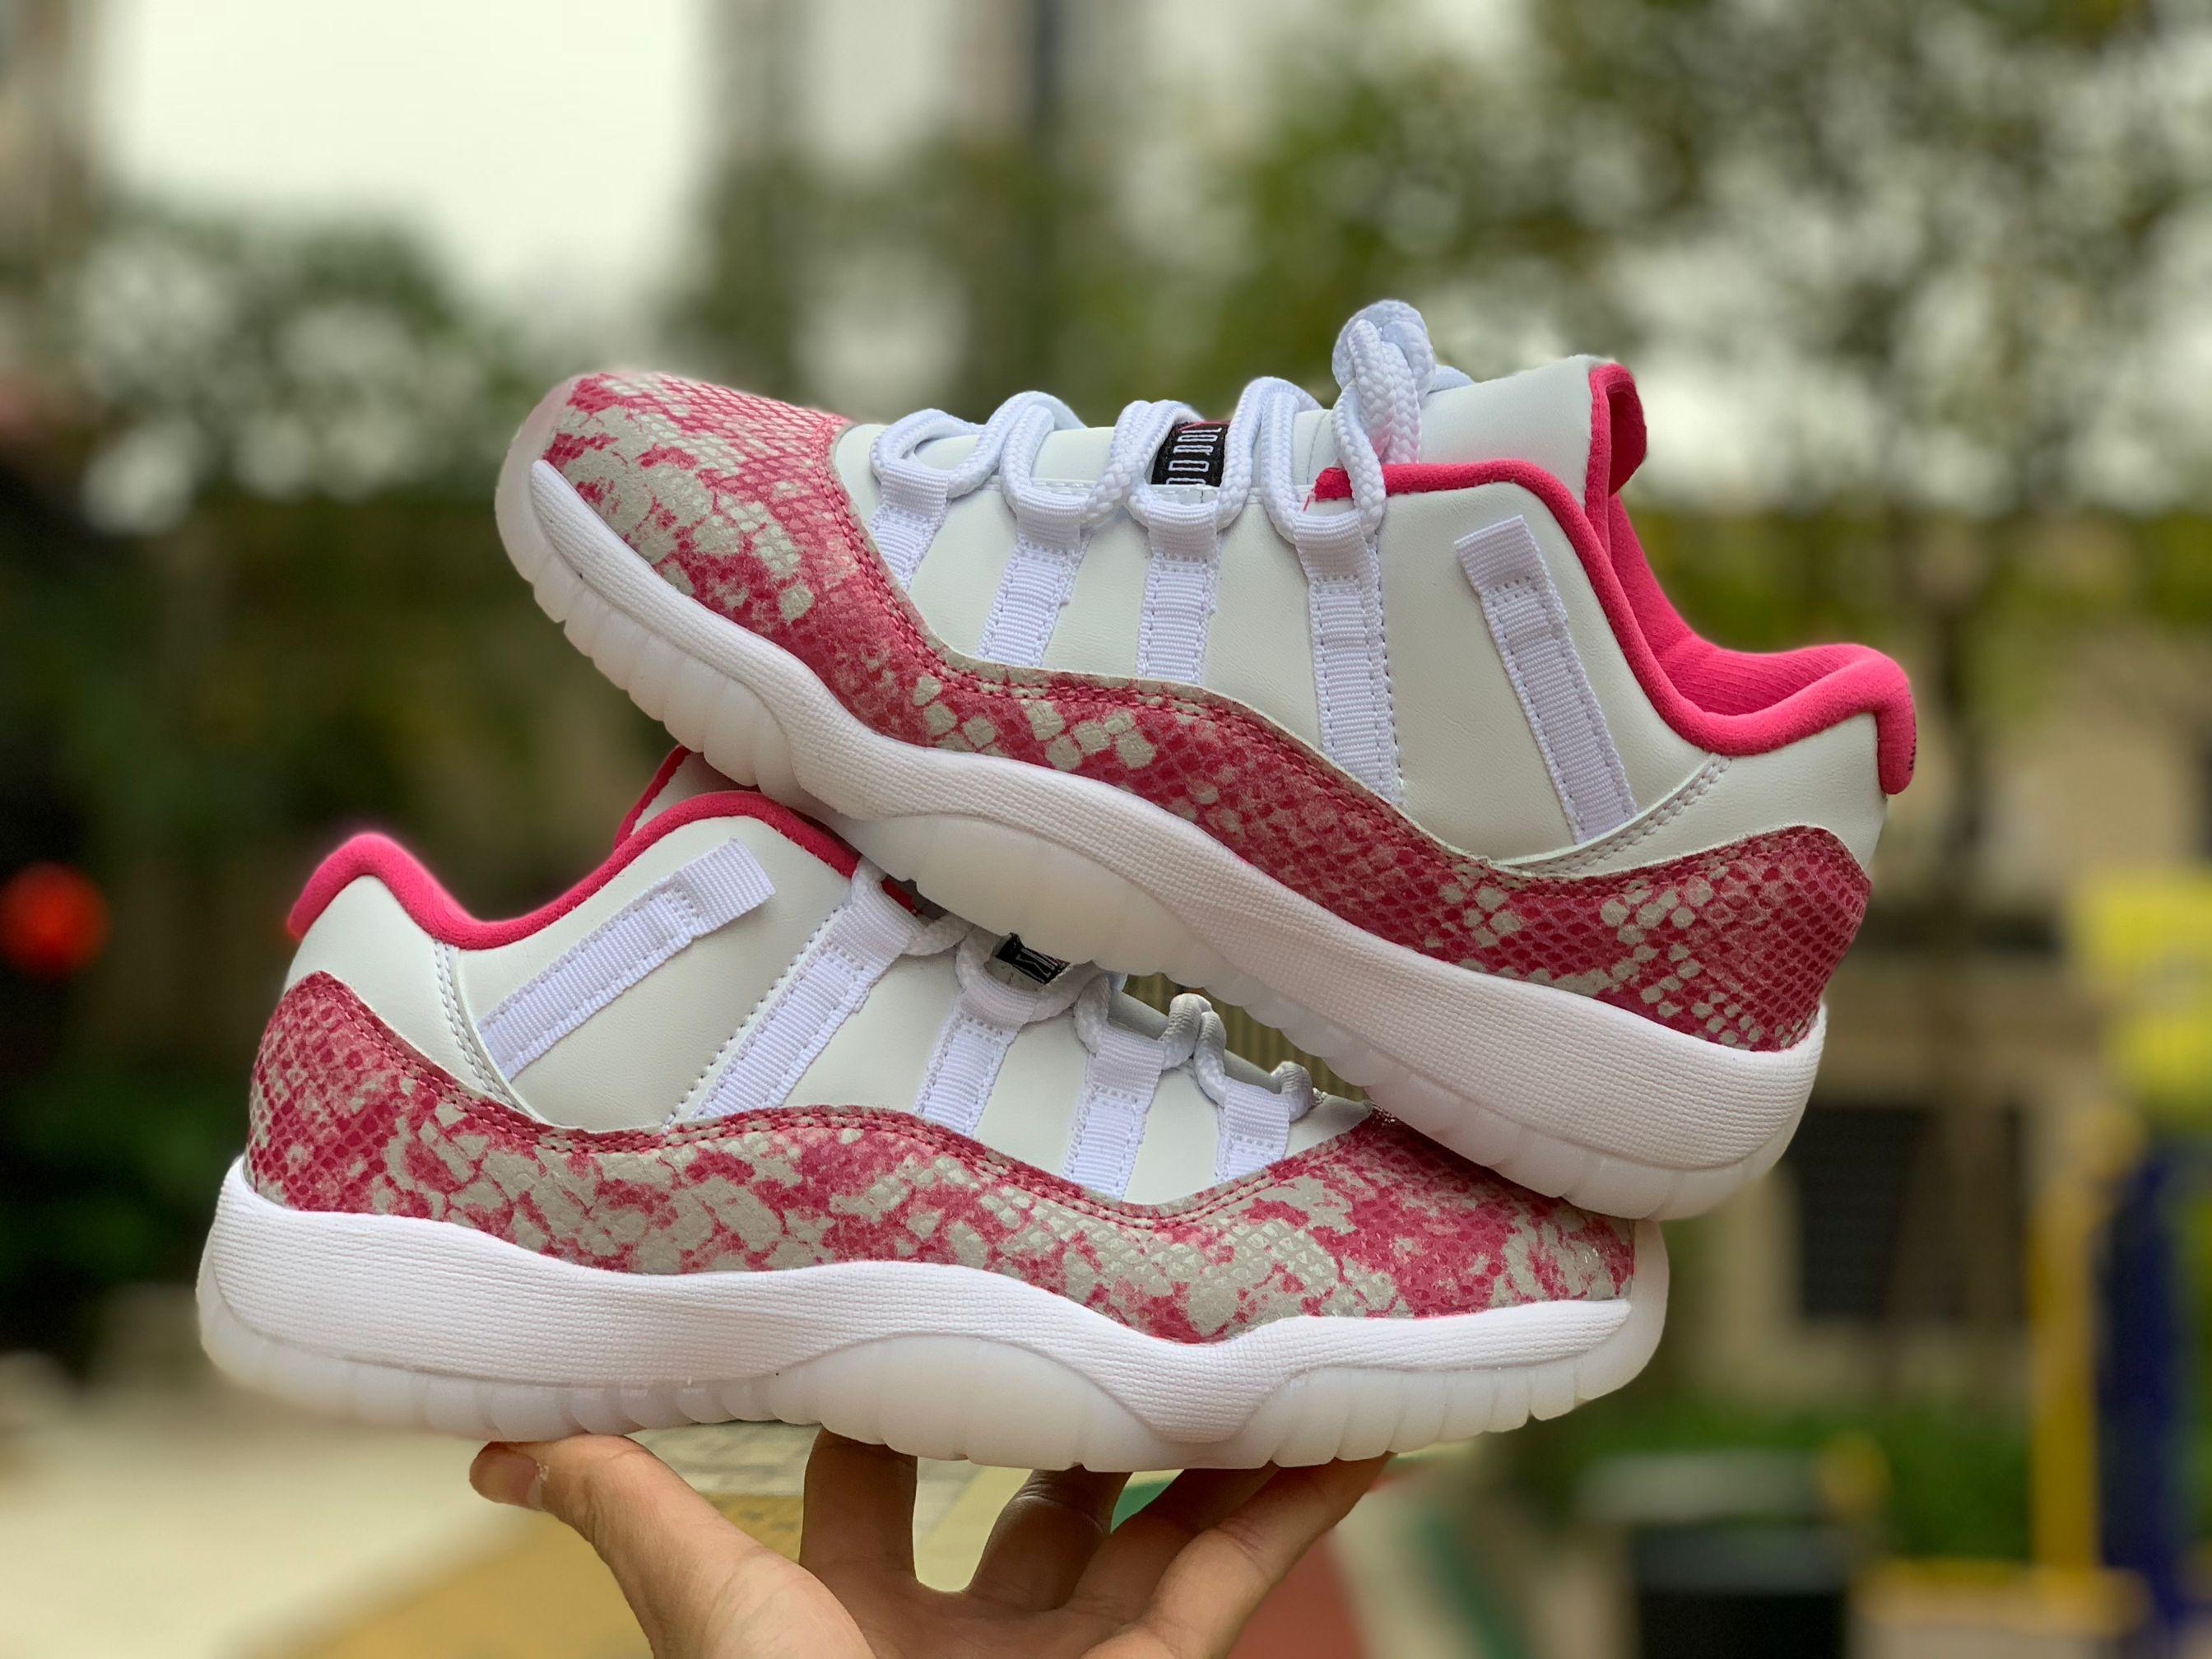 2019 Air Jordan 11 Low WMNS Pink Snakeskin For Sale